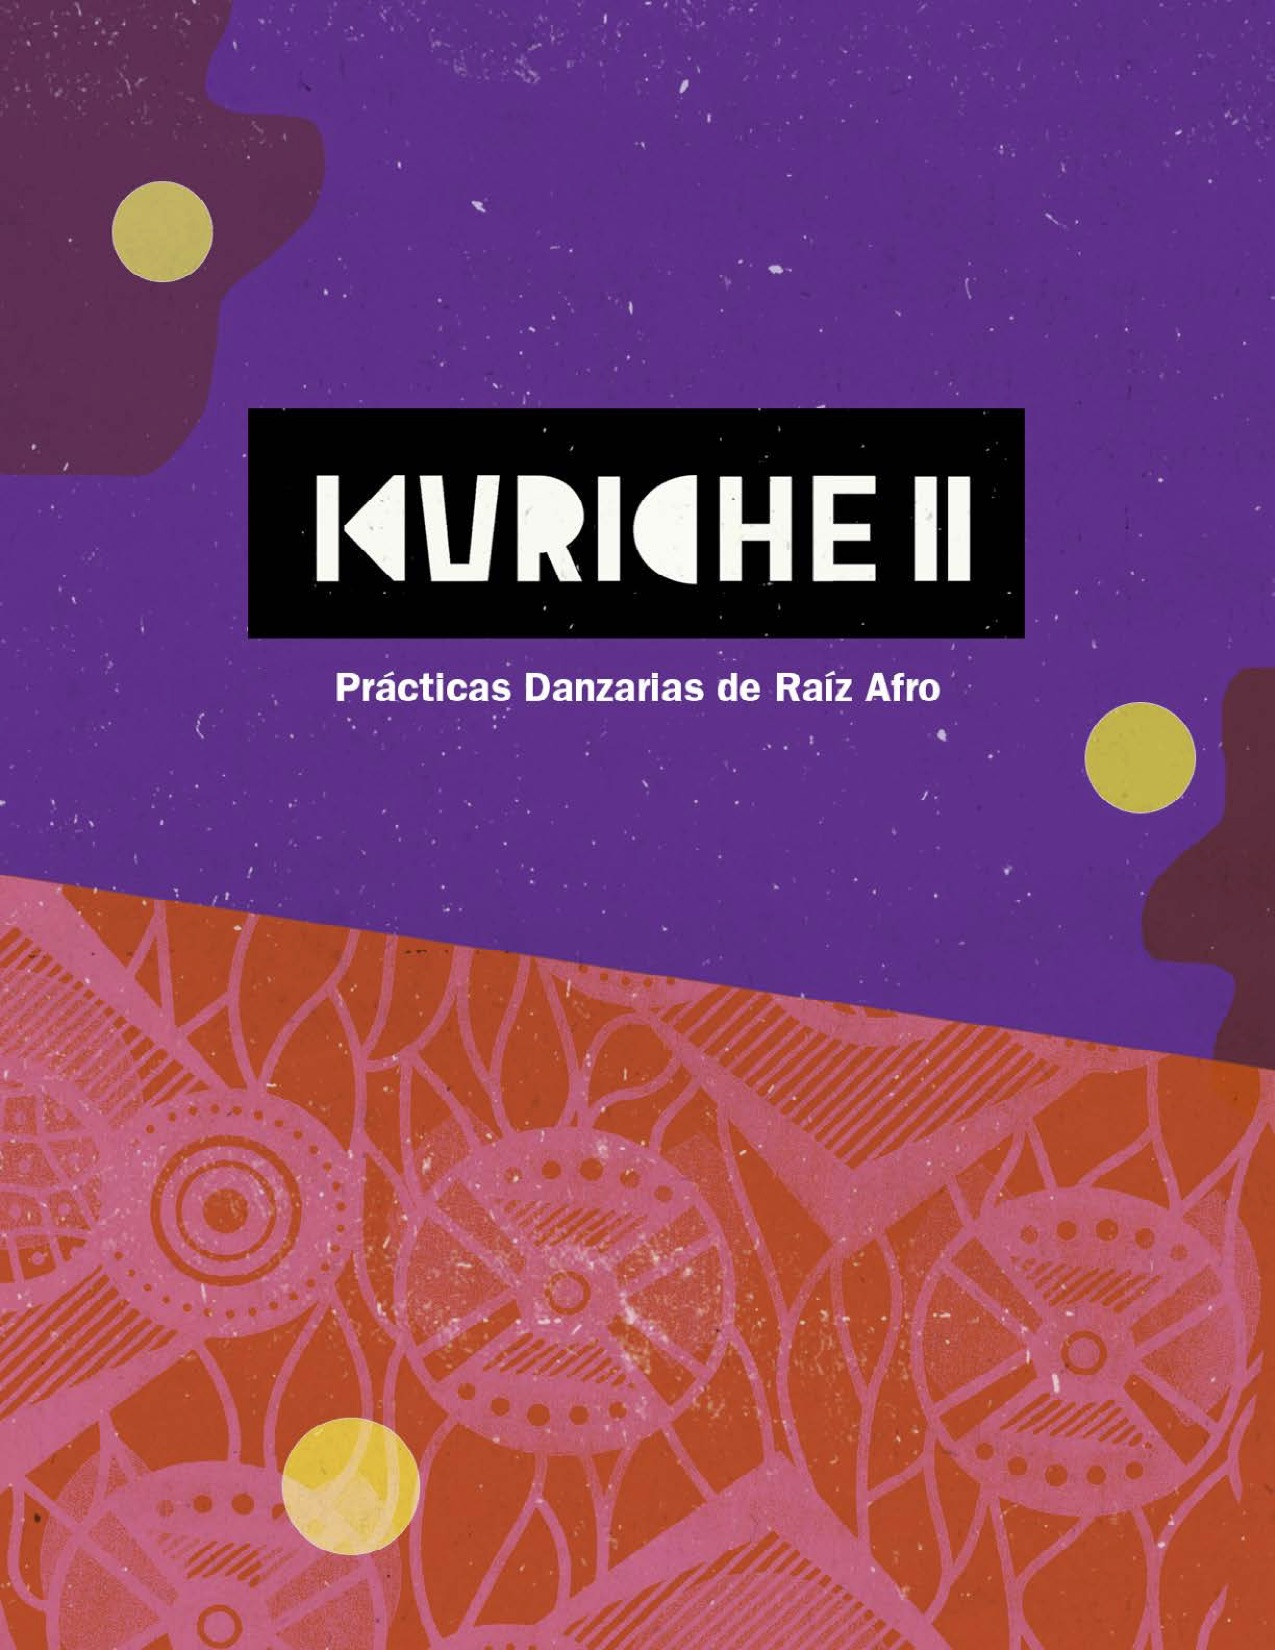 kuriche-dic